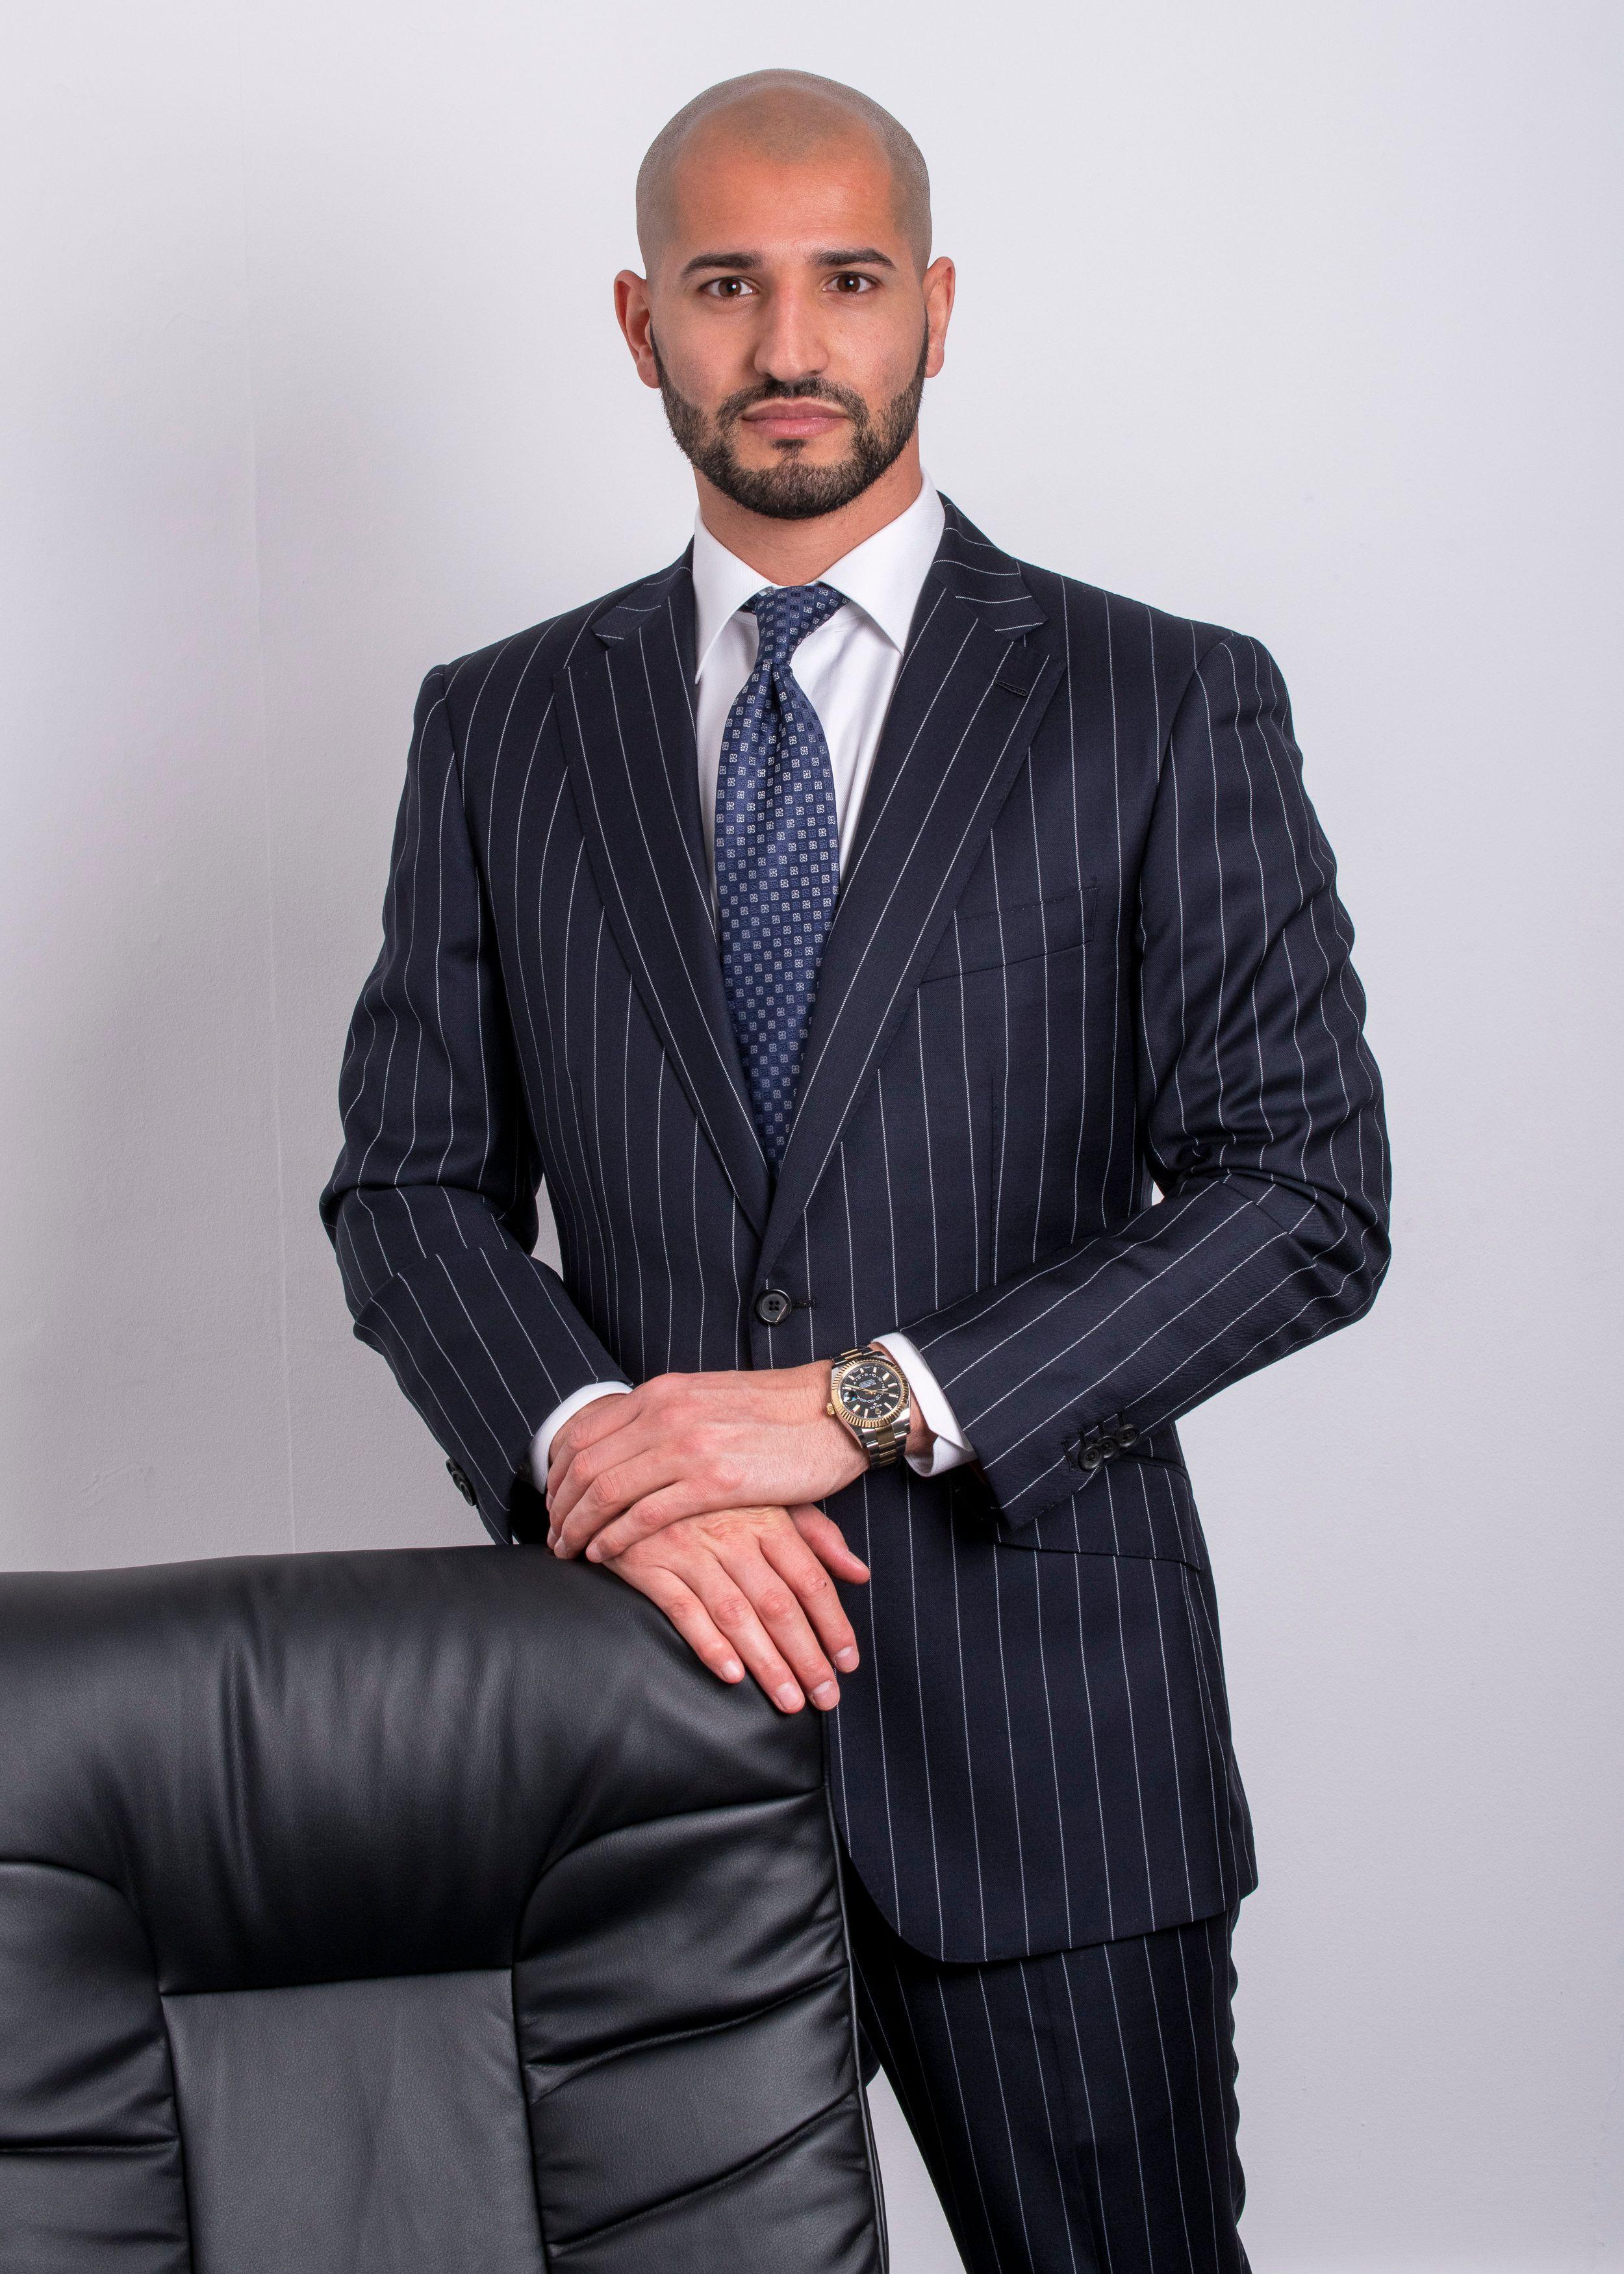 Rafael Macedo